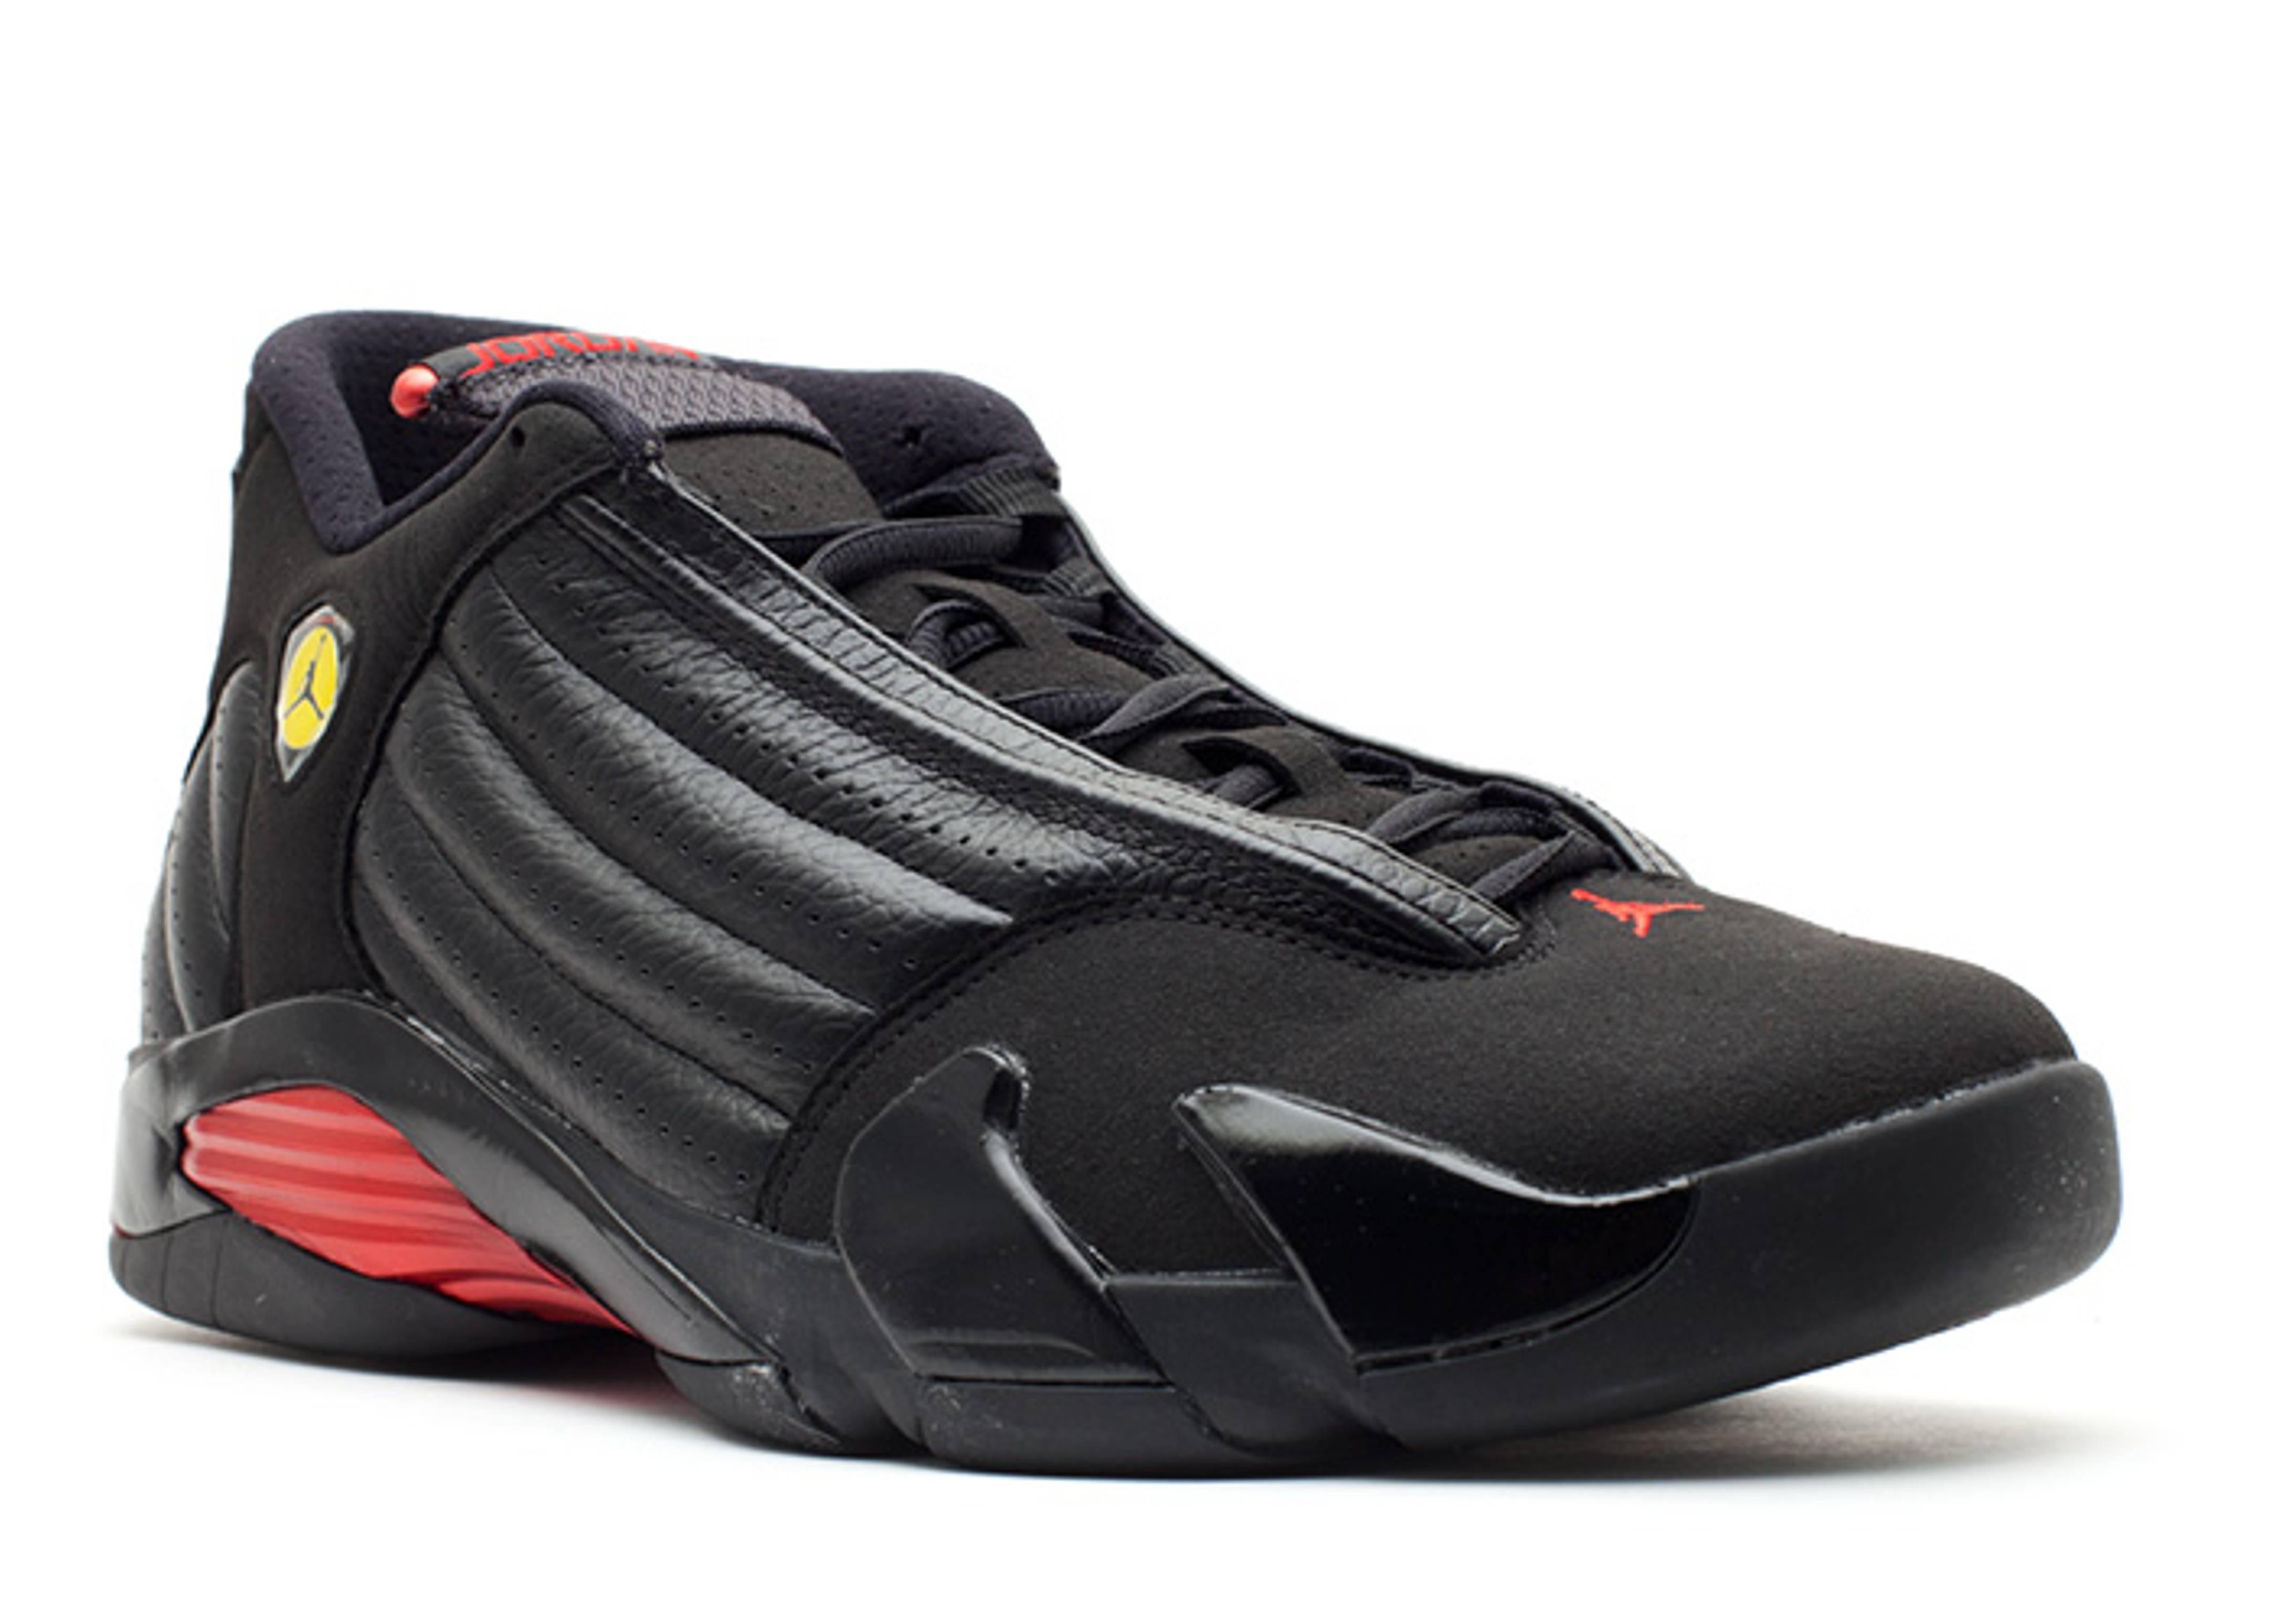 Jordan Last Shoes